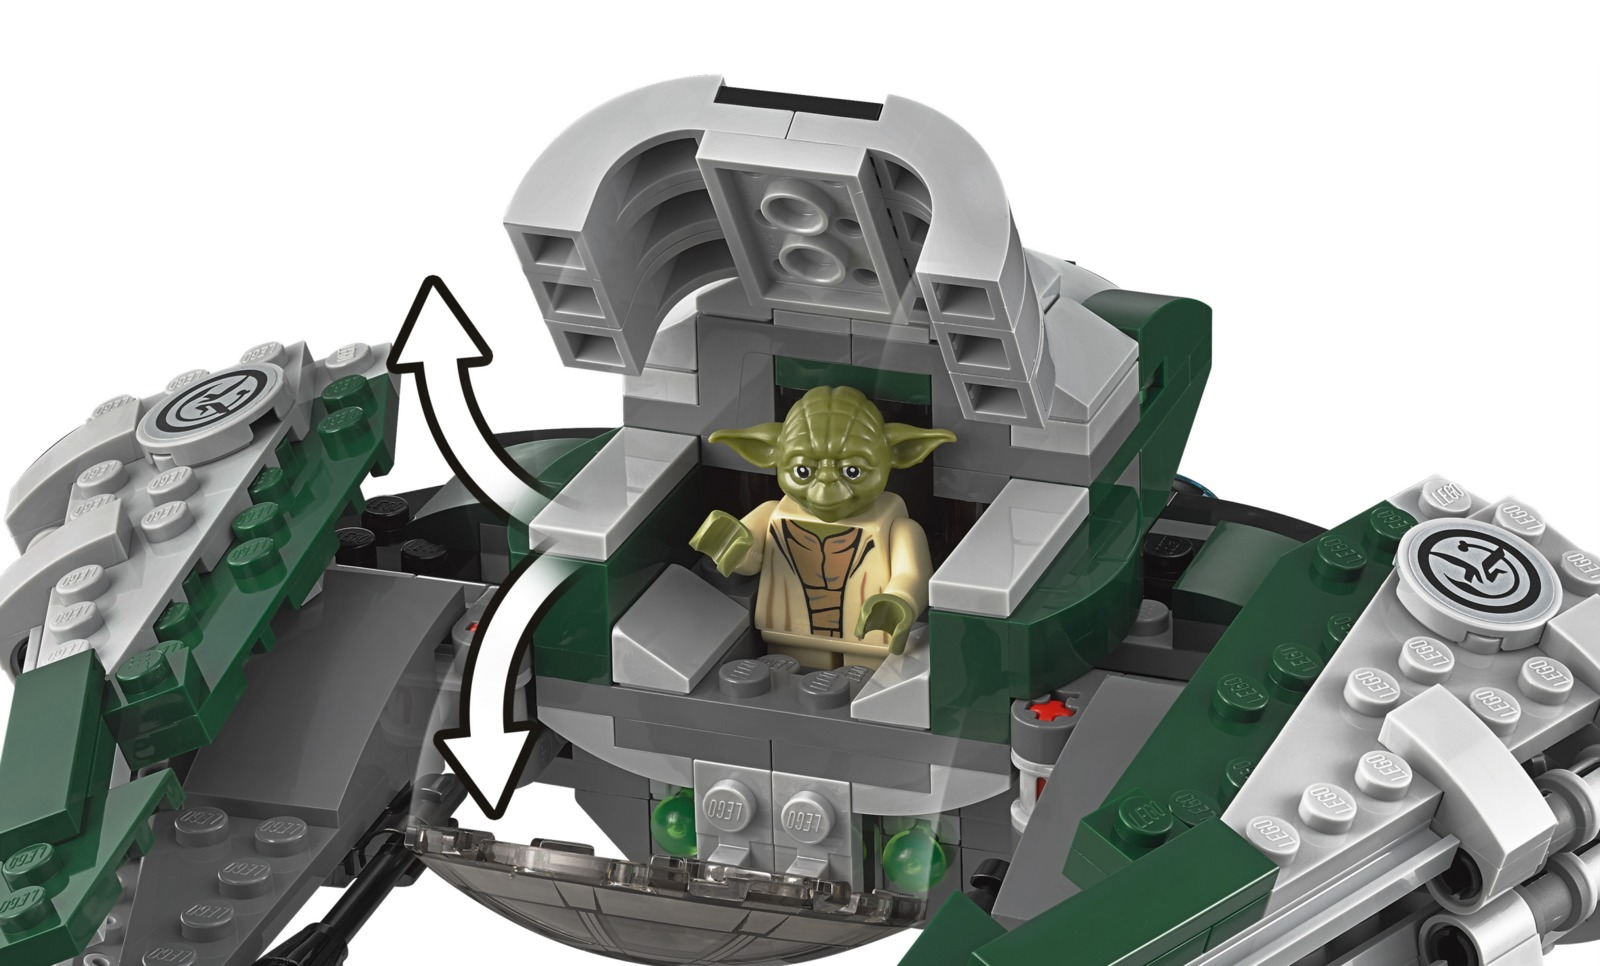 LEGO Star Wars: Yoda's Jedi Starfighter (75168) image